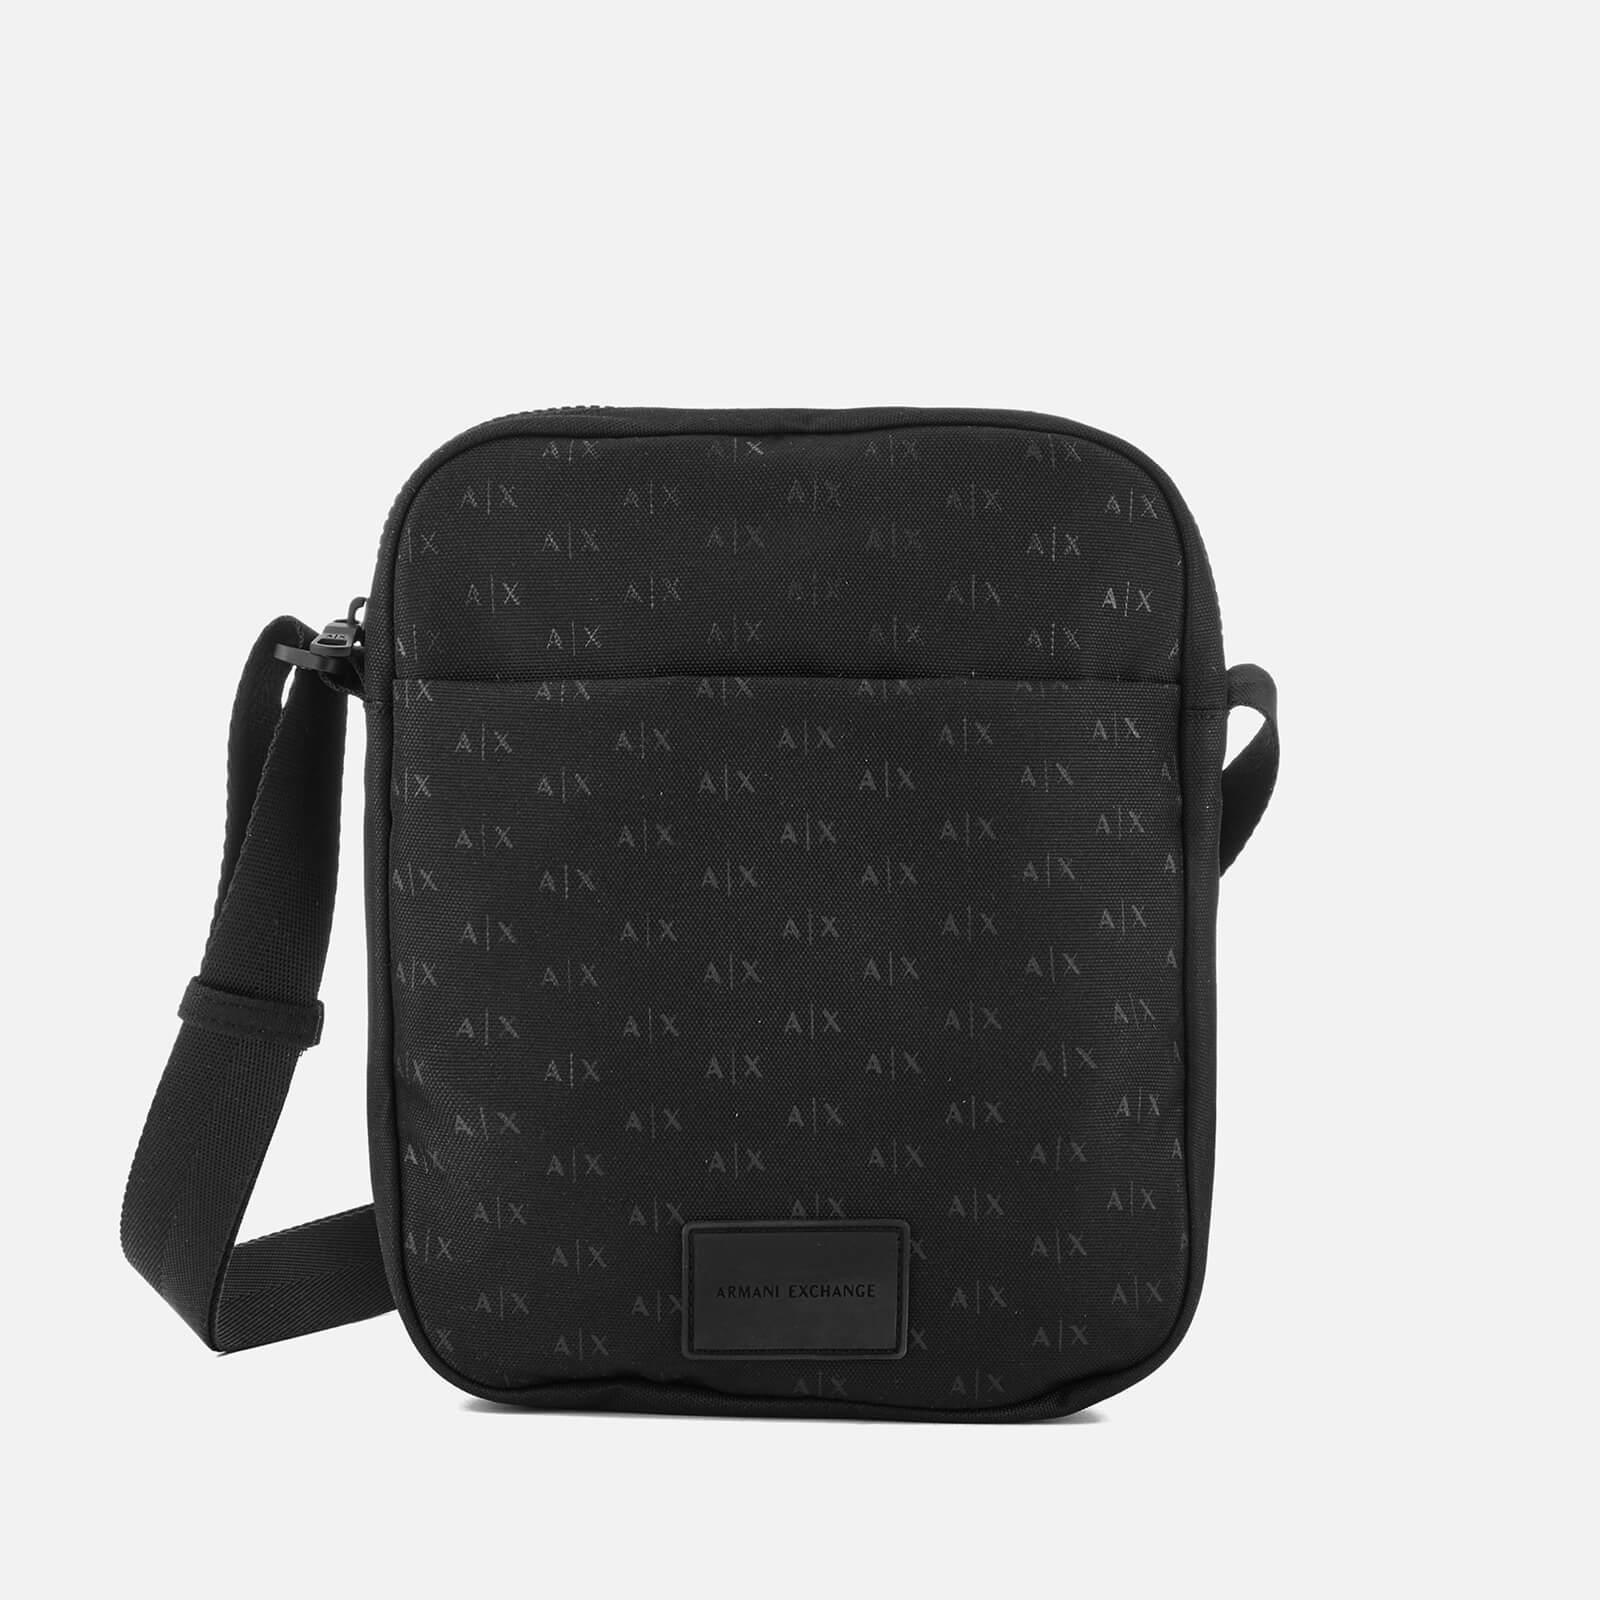 f2e26d5a510 Armani Exchange Black Ax All Over Logo Cross Body Bag for men